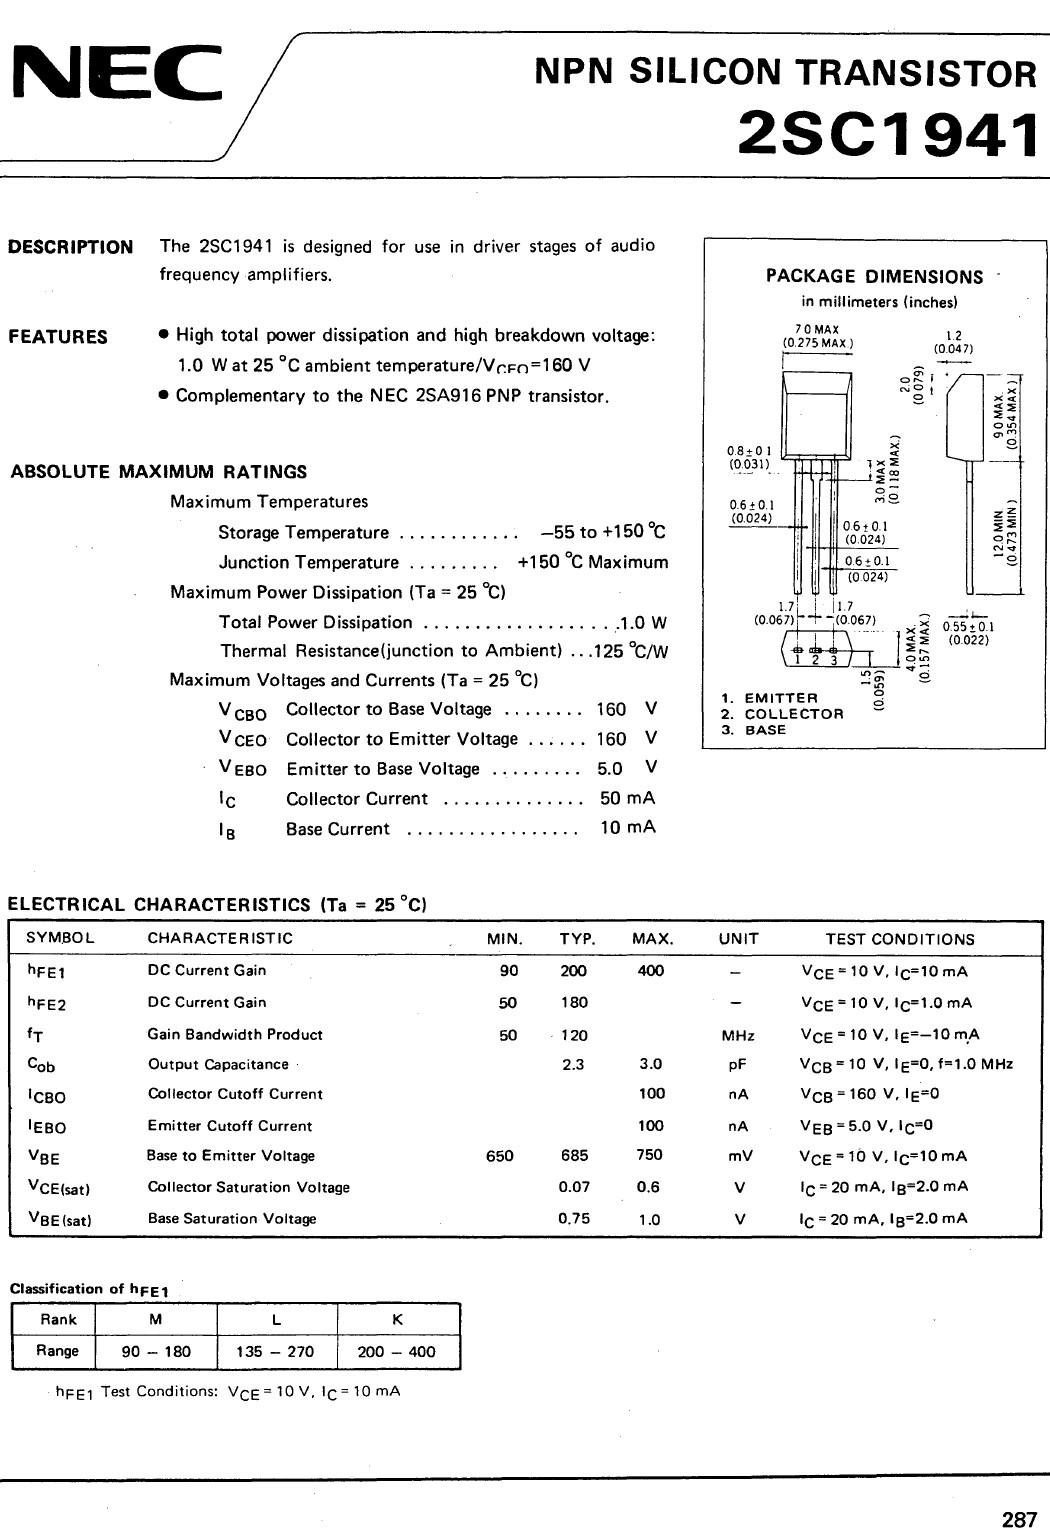 SI-N 160V 0.05A 1W 120MHz NF 2SC1941